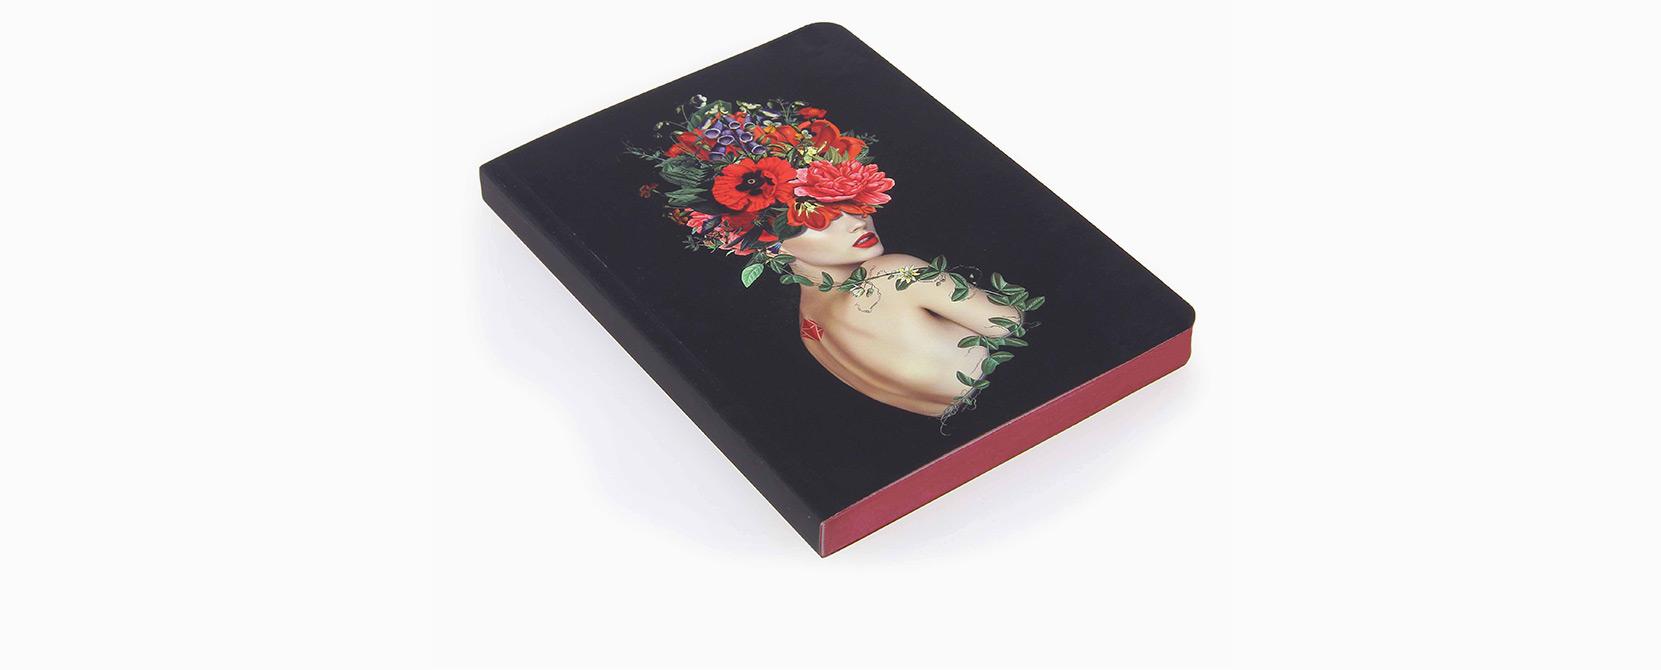 Cuaderno ilustrado Simone - Reina de Diamantes